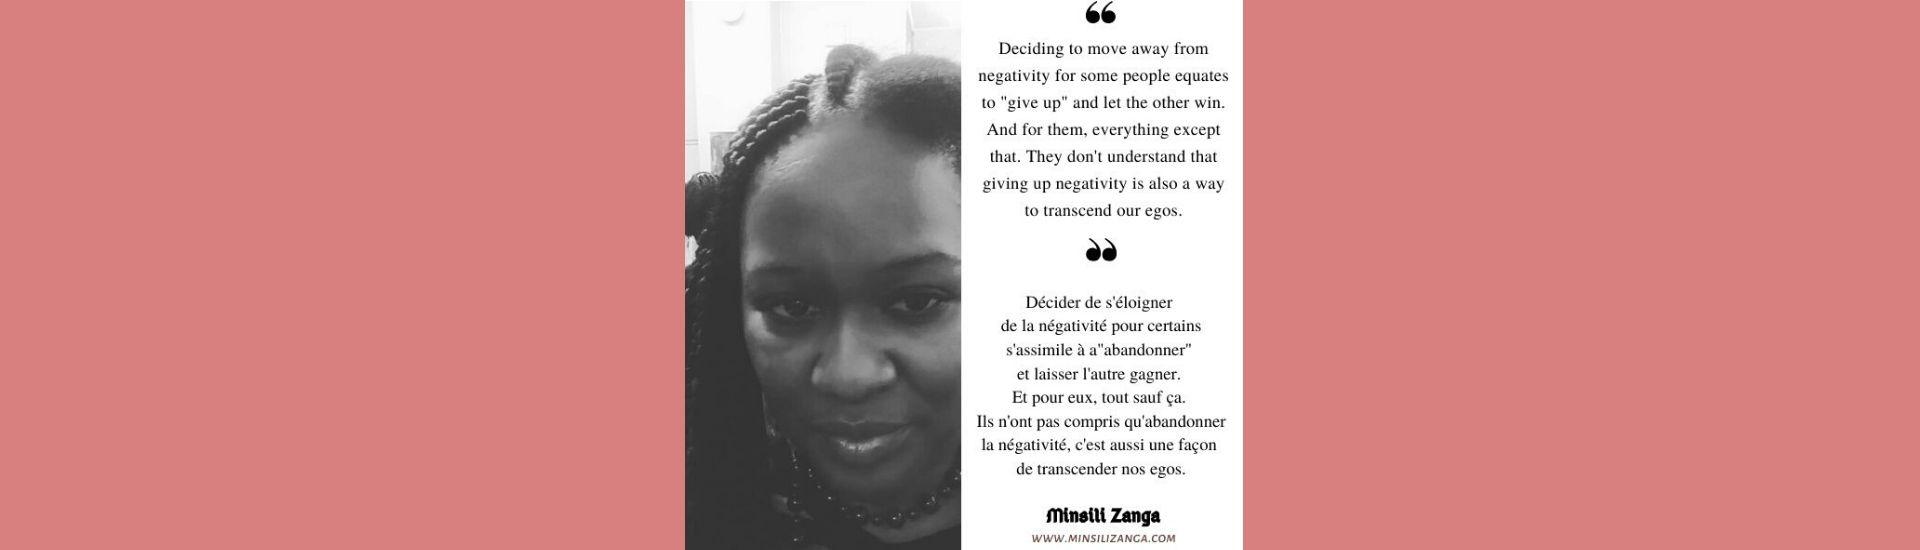 De la tranquillité d'esprit - 3 (Minsili ZANGA)